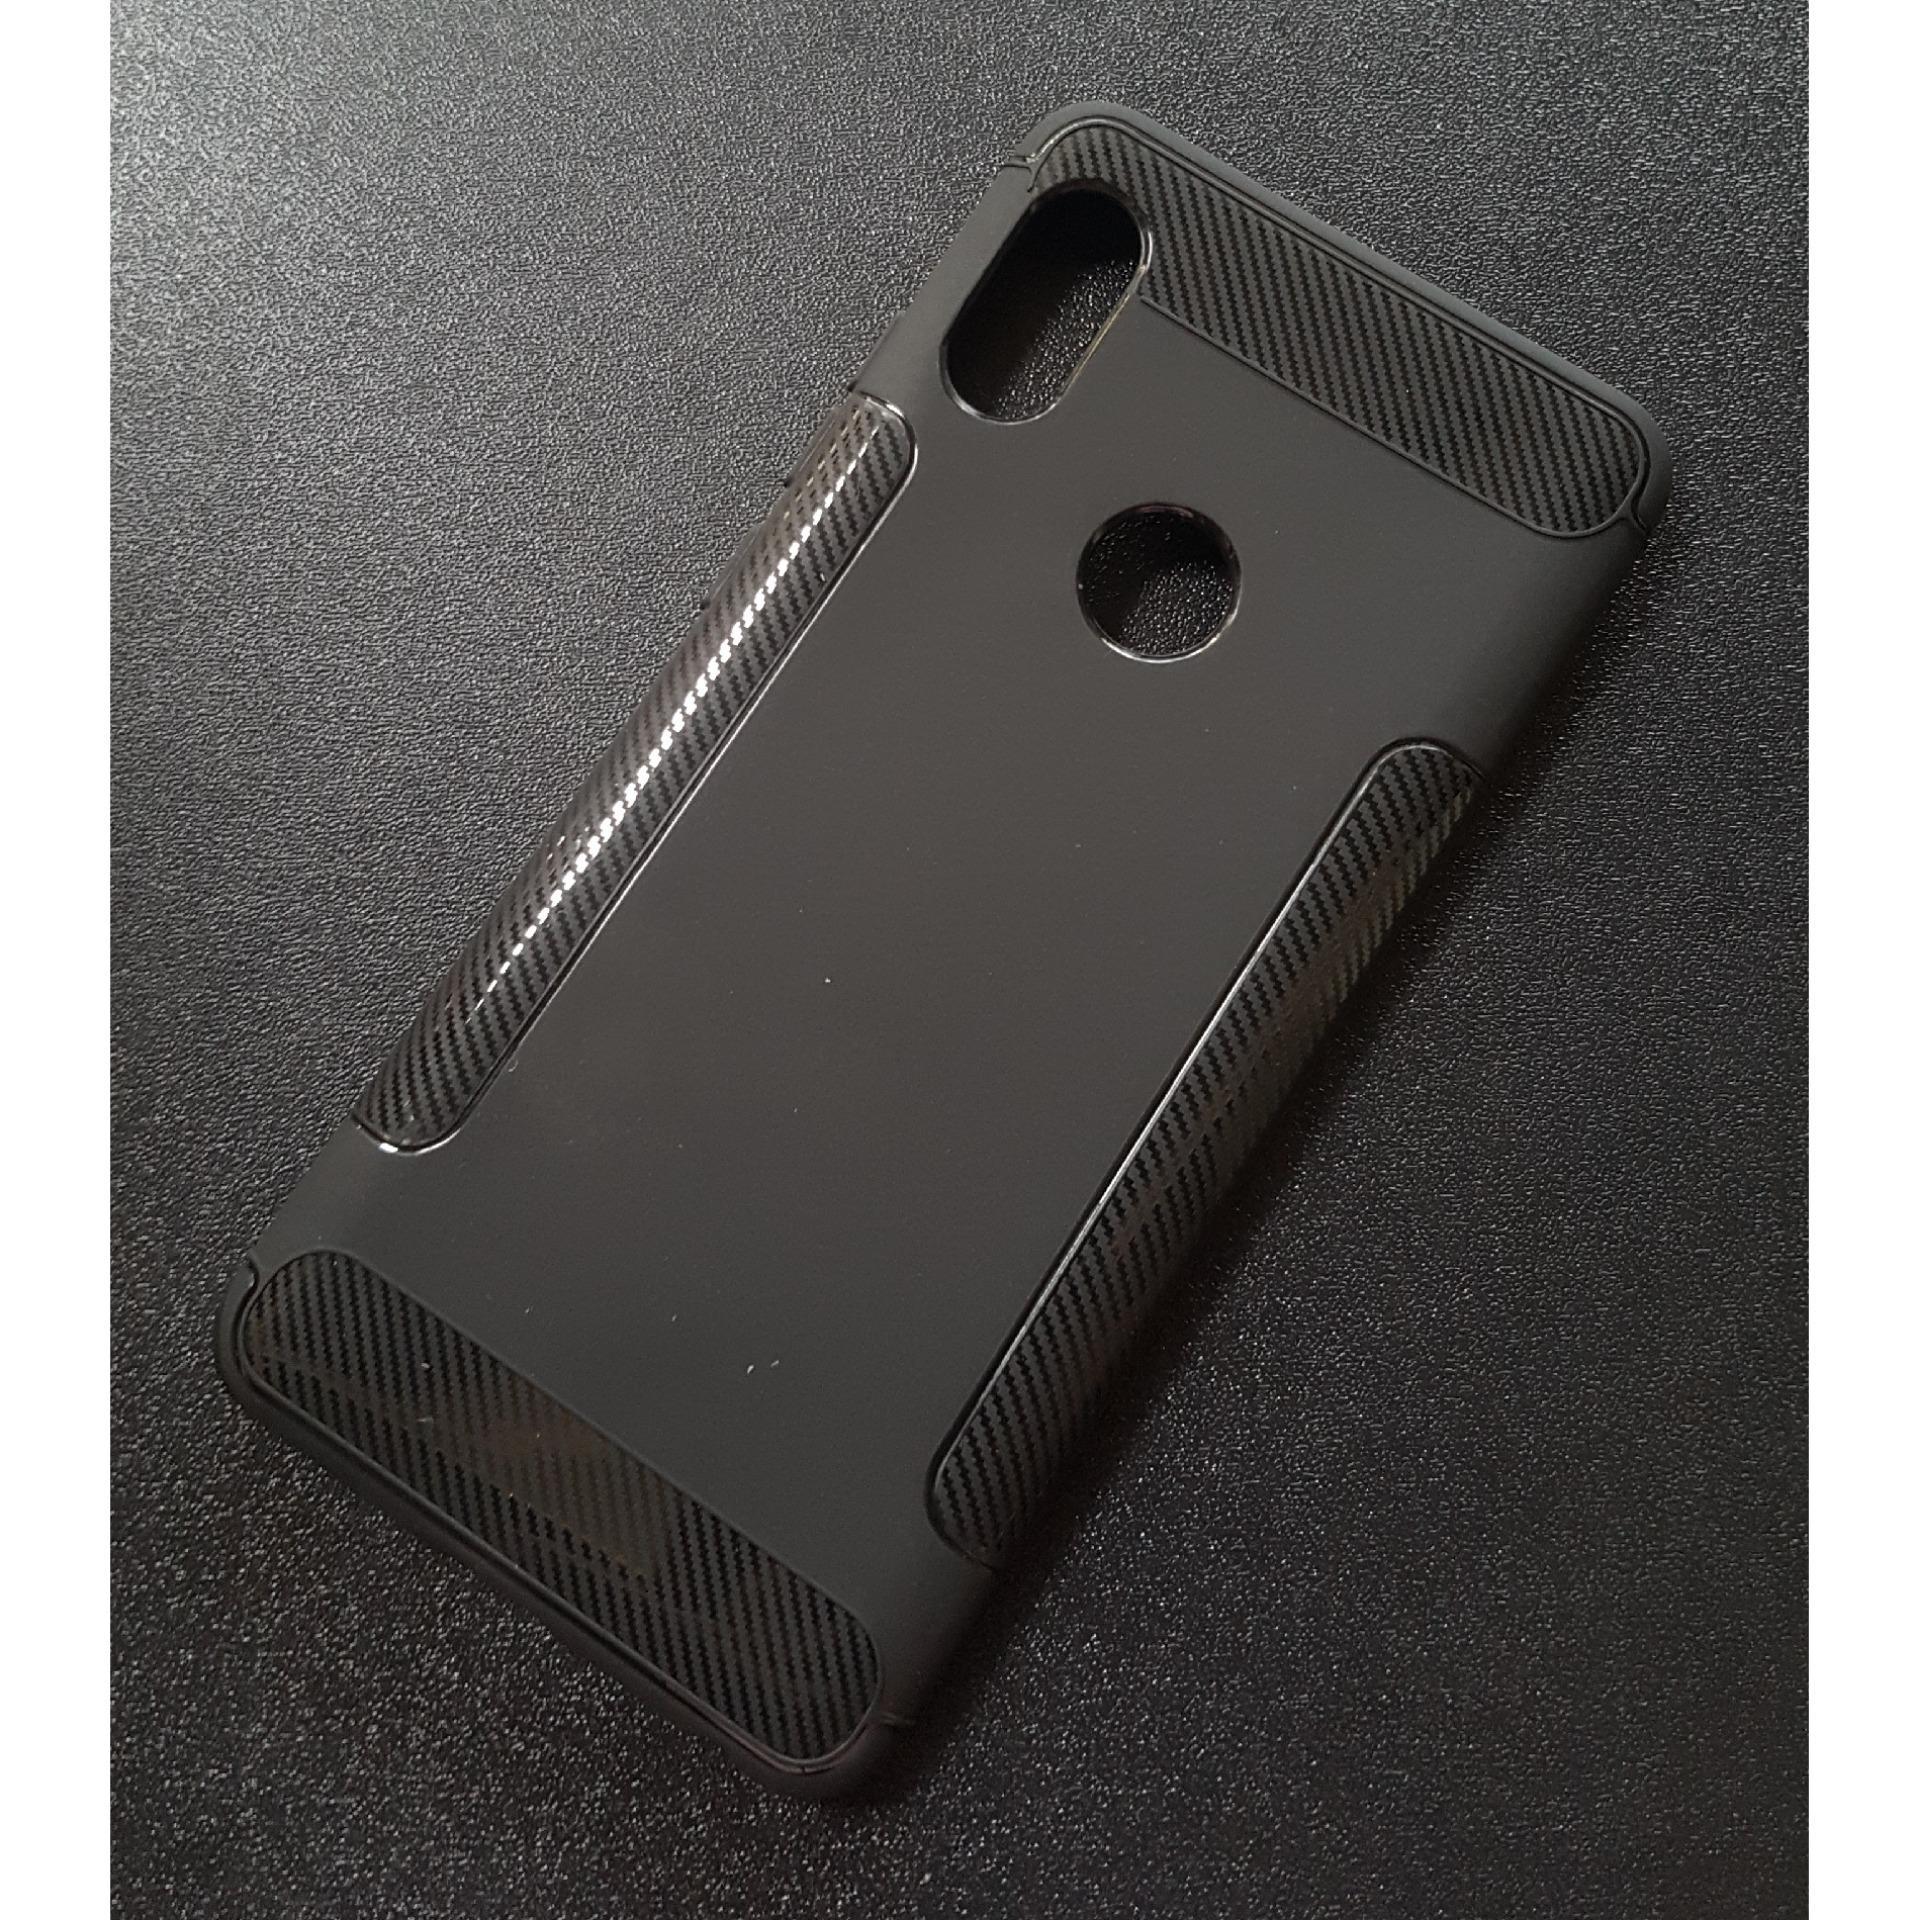 Segini Aja Harga Xiaomi Redmi 2 Pro Terbaru 2018 Murah Softcase S2 Case Note 5 Mi 6x A2 Silikon Berbagai